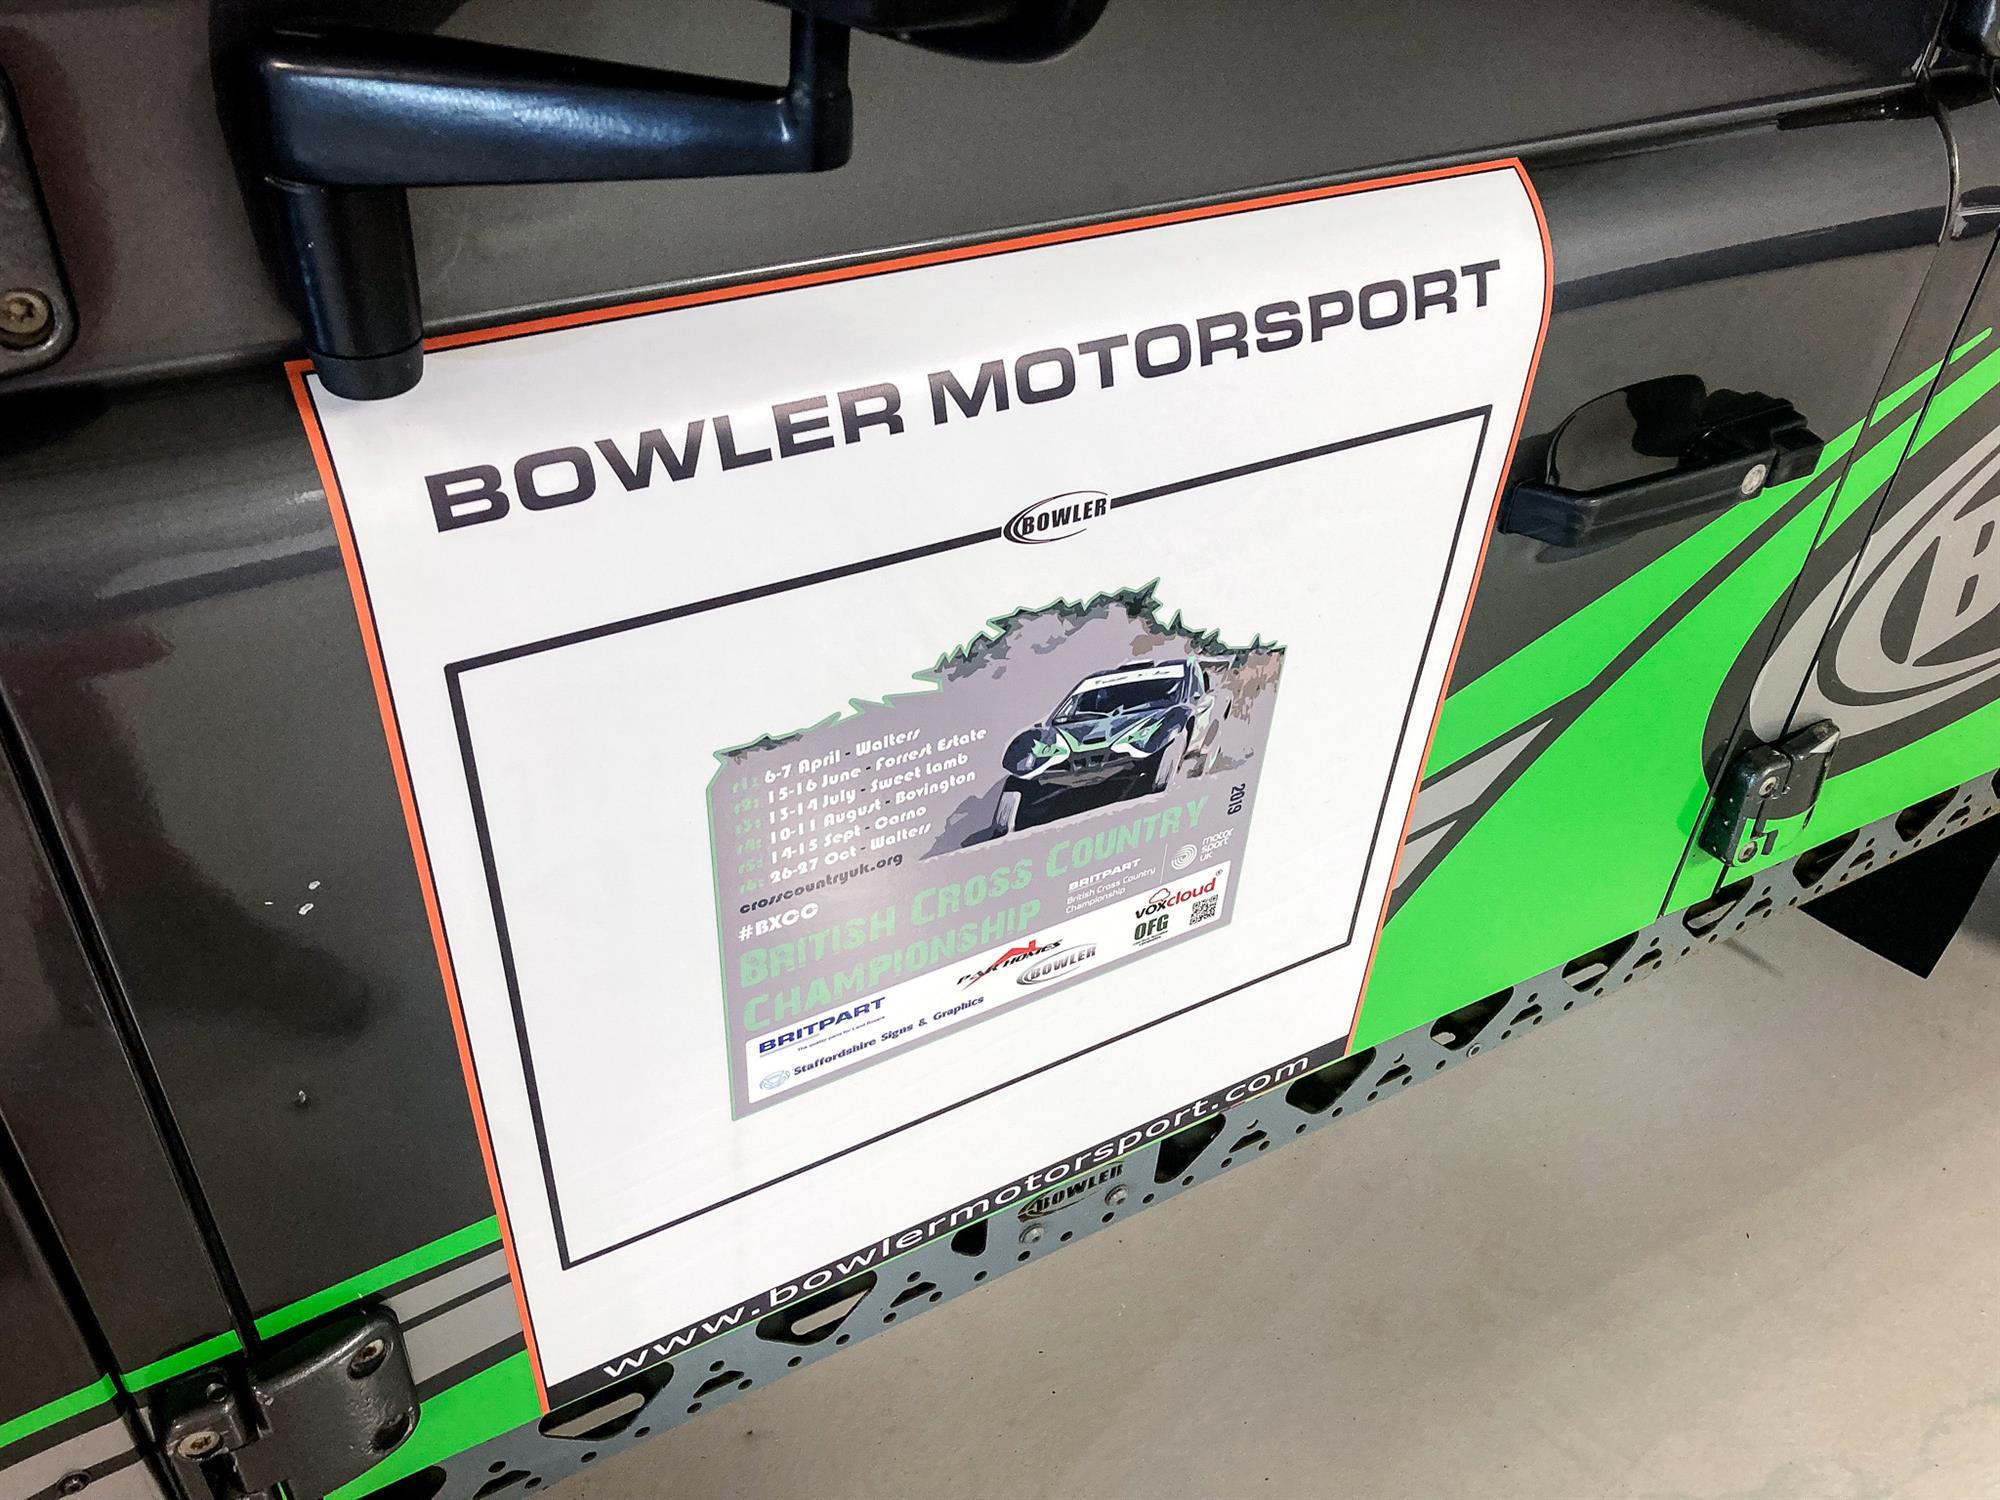 2016 Bowler CSP V8 Prototype 'P1' - Image 10 of 14